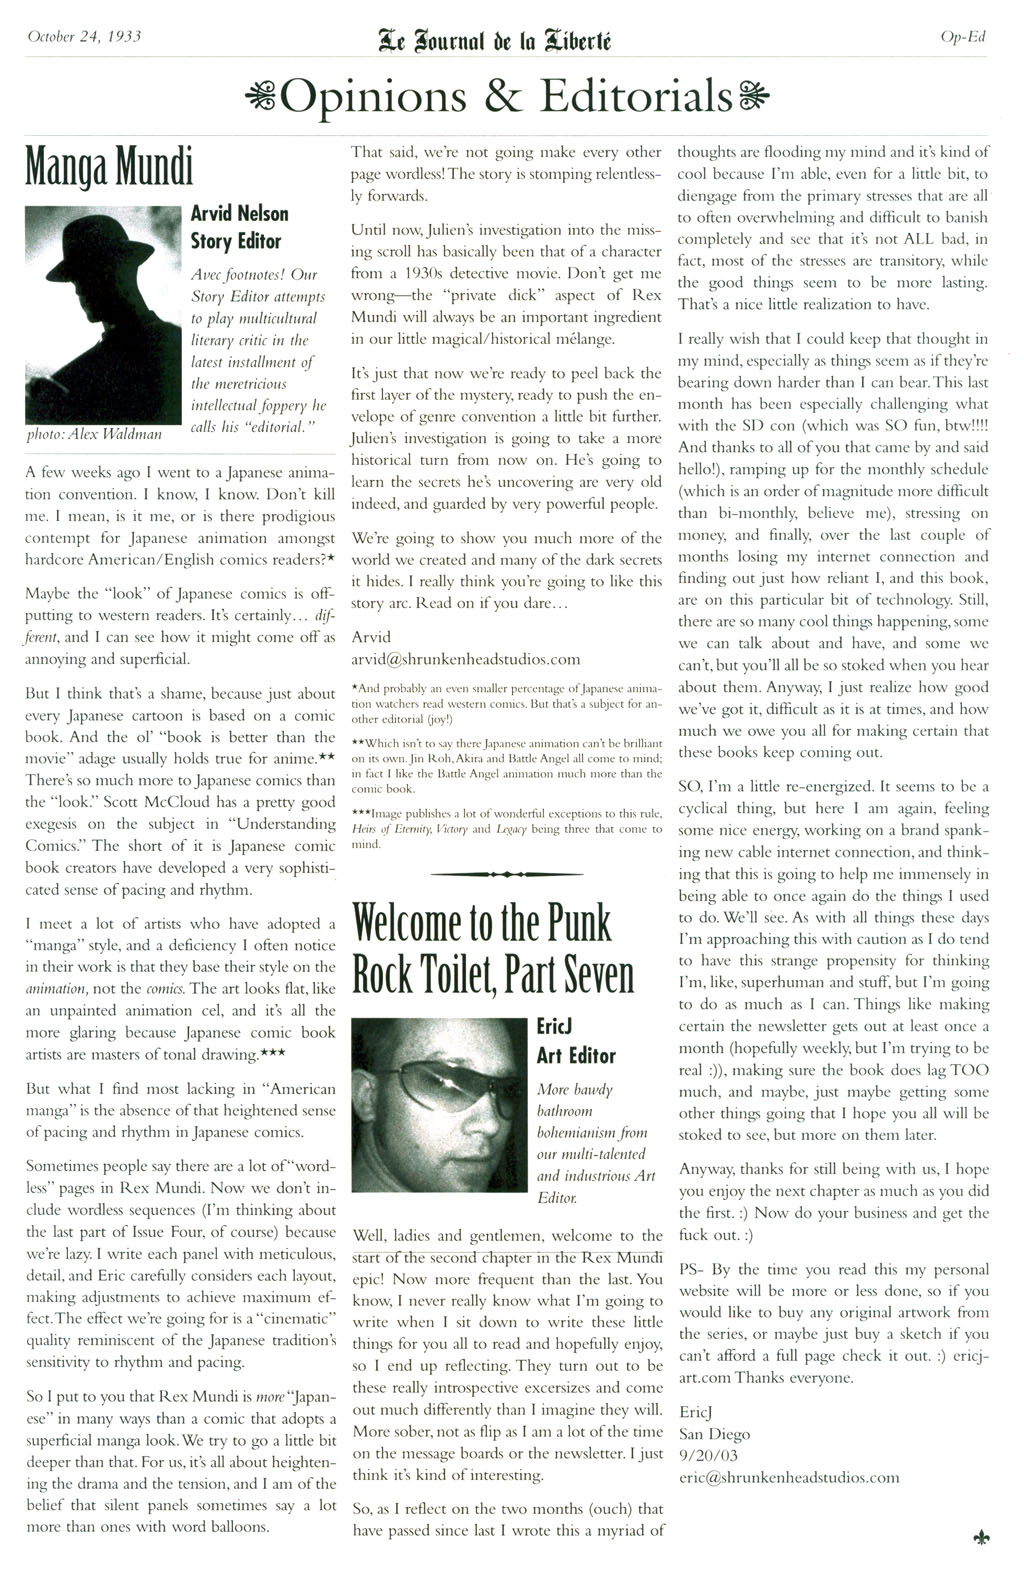 Read online Rex Mundi comic -  Issue #6 - 28